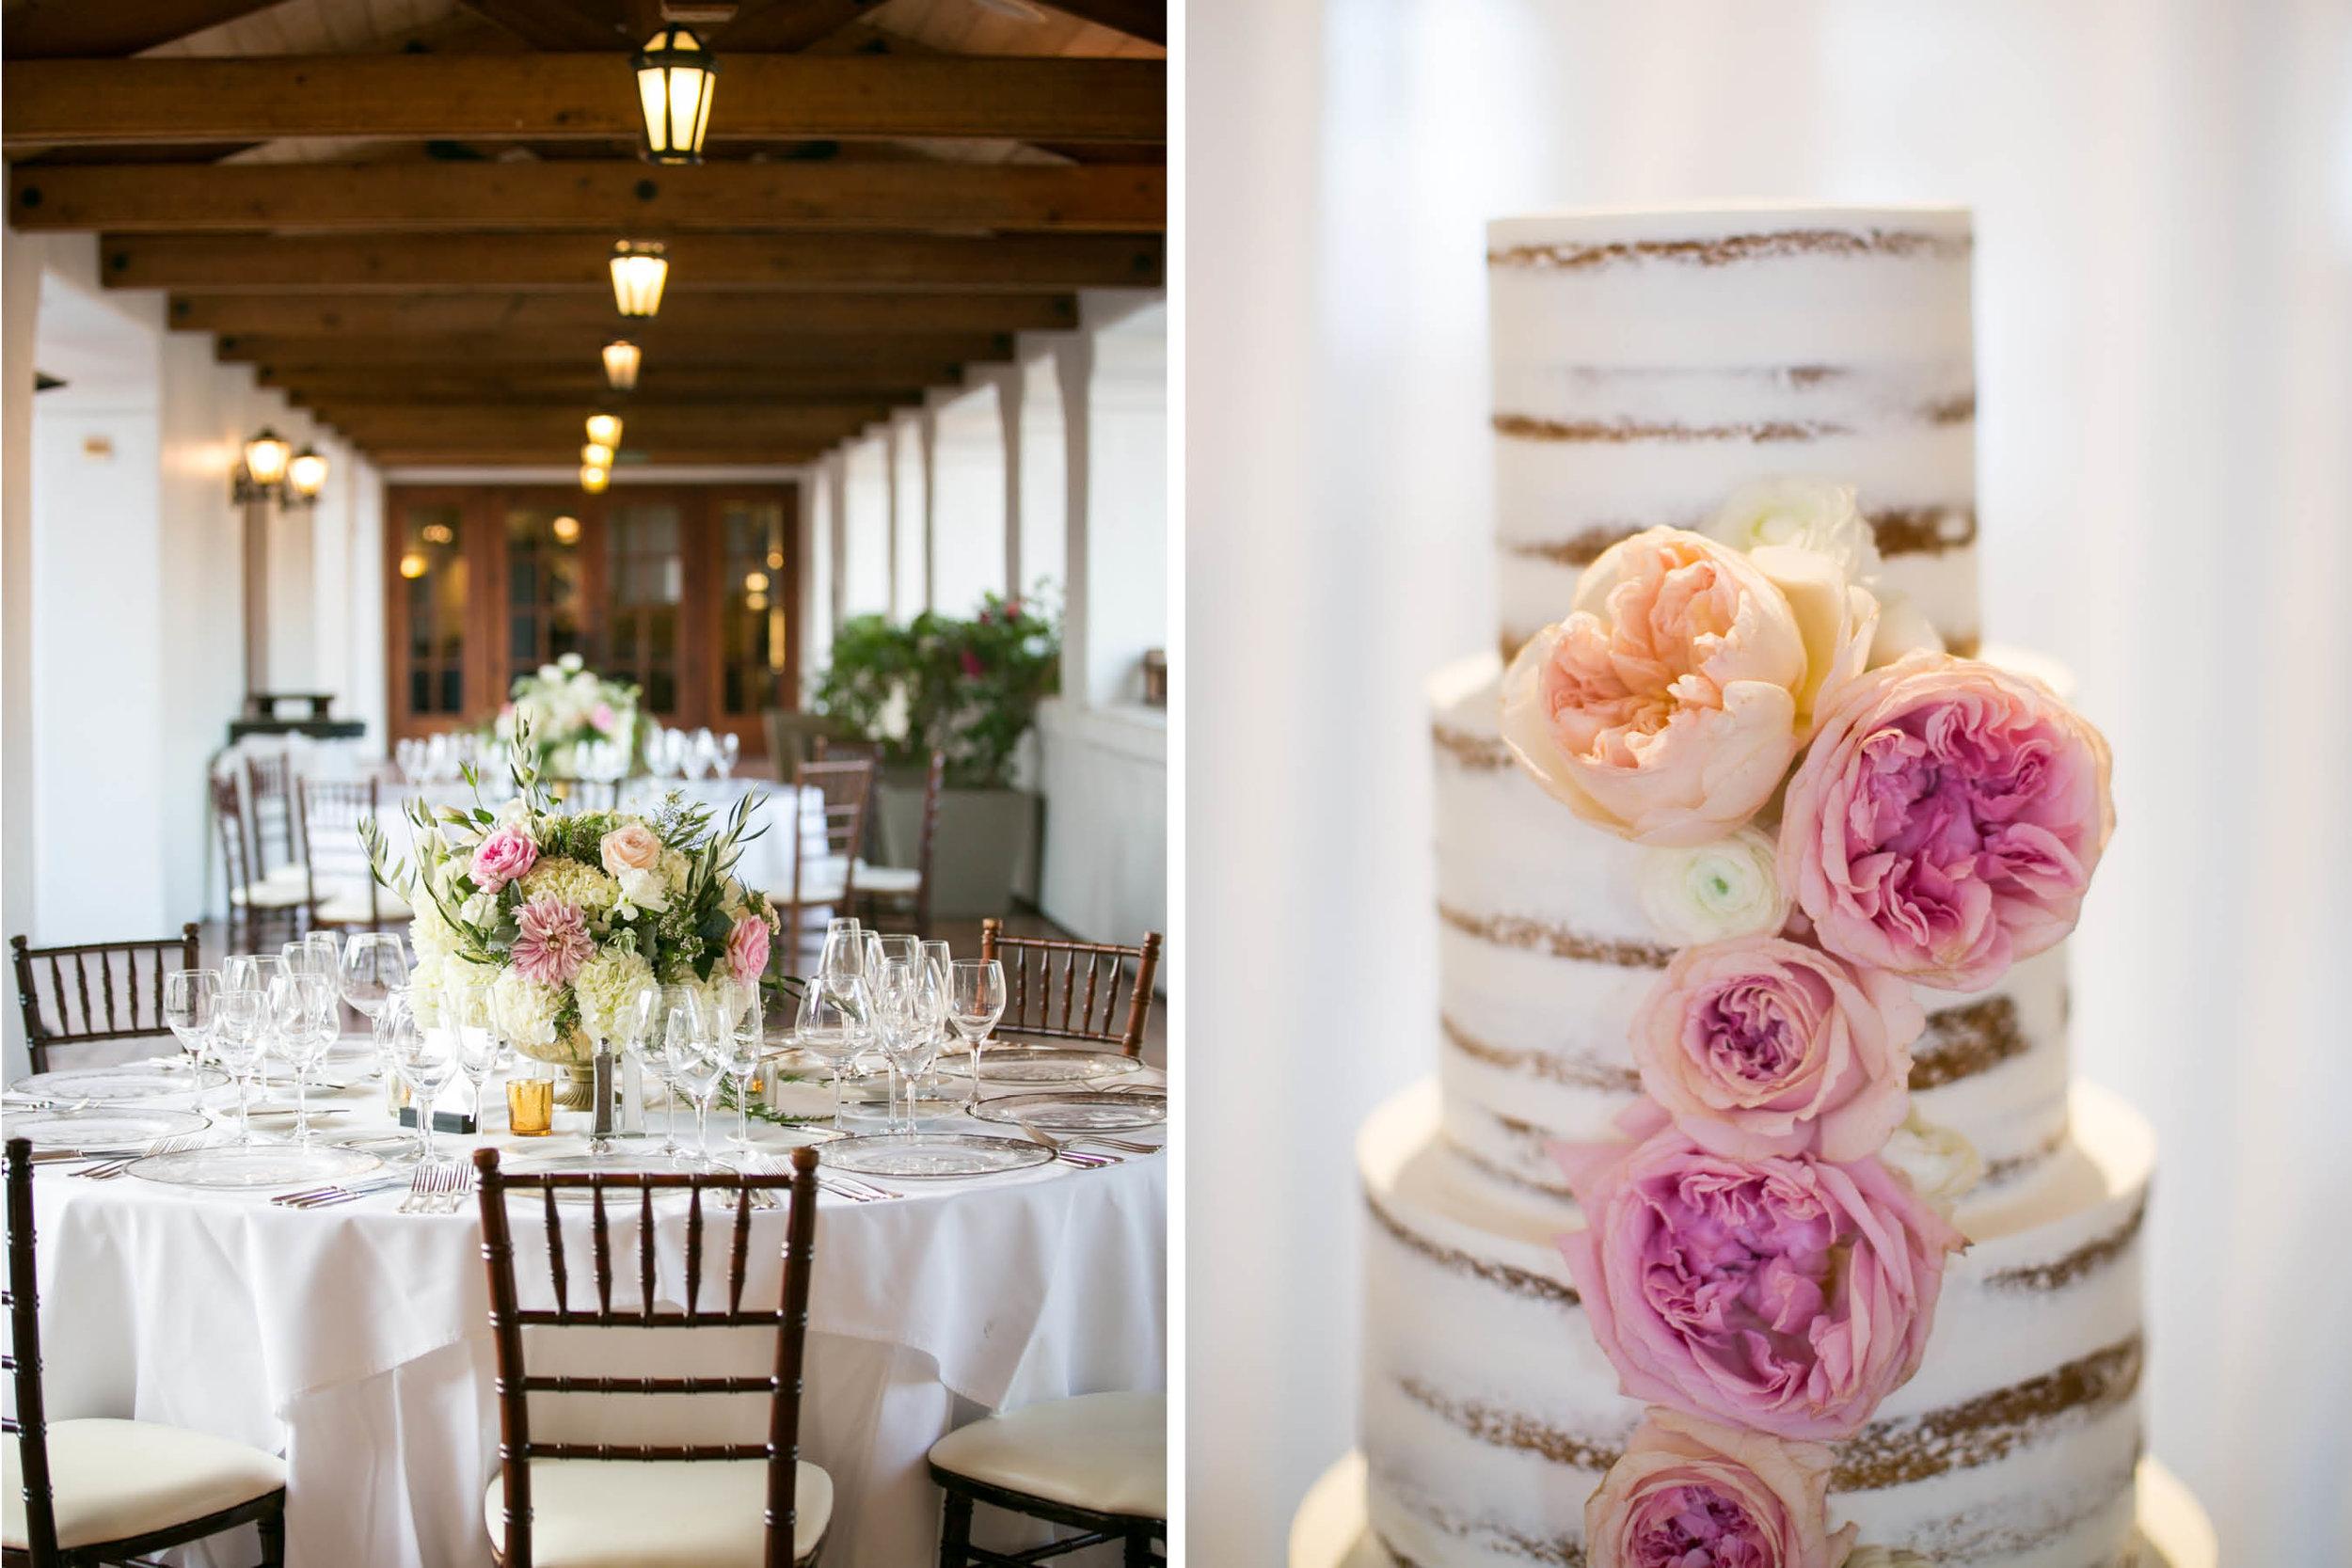 alegria-by-design-wedding-planner-planning-coordinator-day-off-event-design-bacara-resort-ritz-carlton-santa-barbara-garden-ocean-view-location-venue-patio (12).jpg